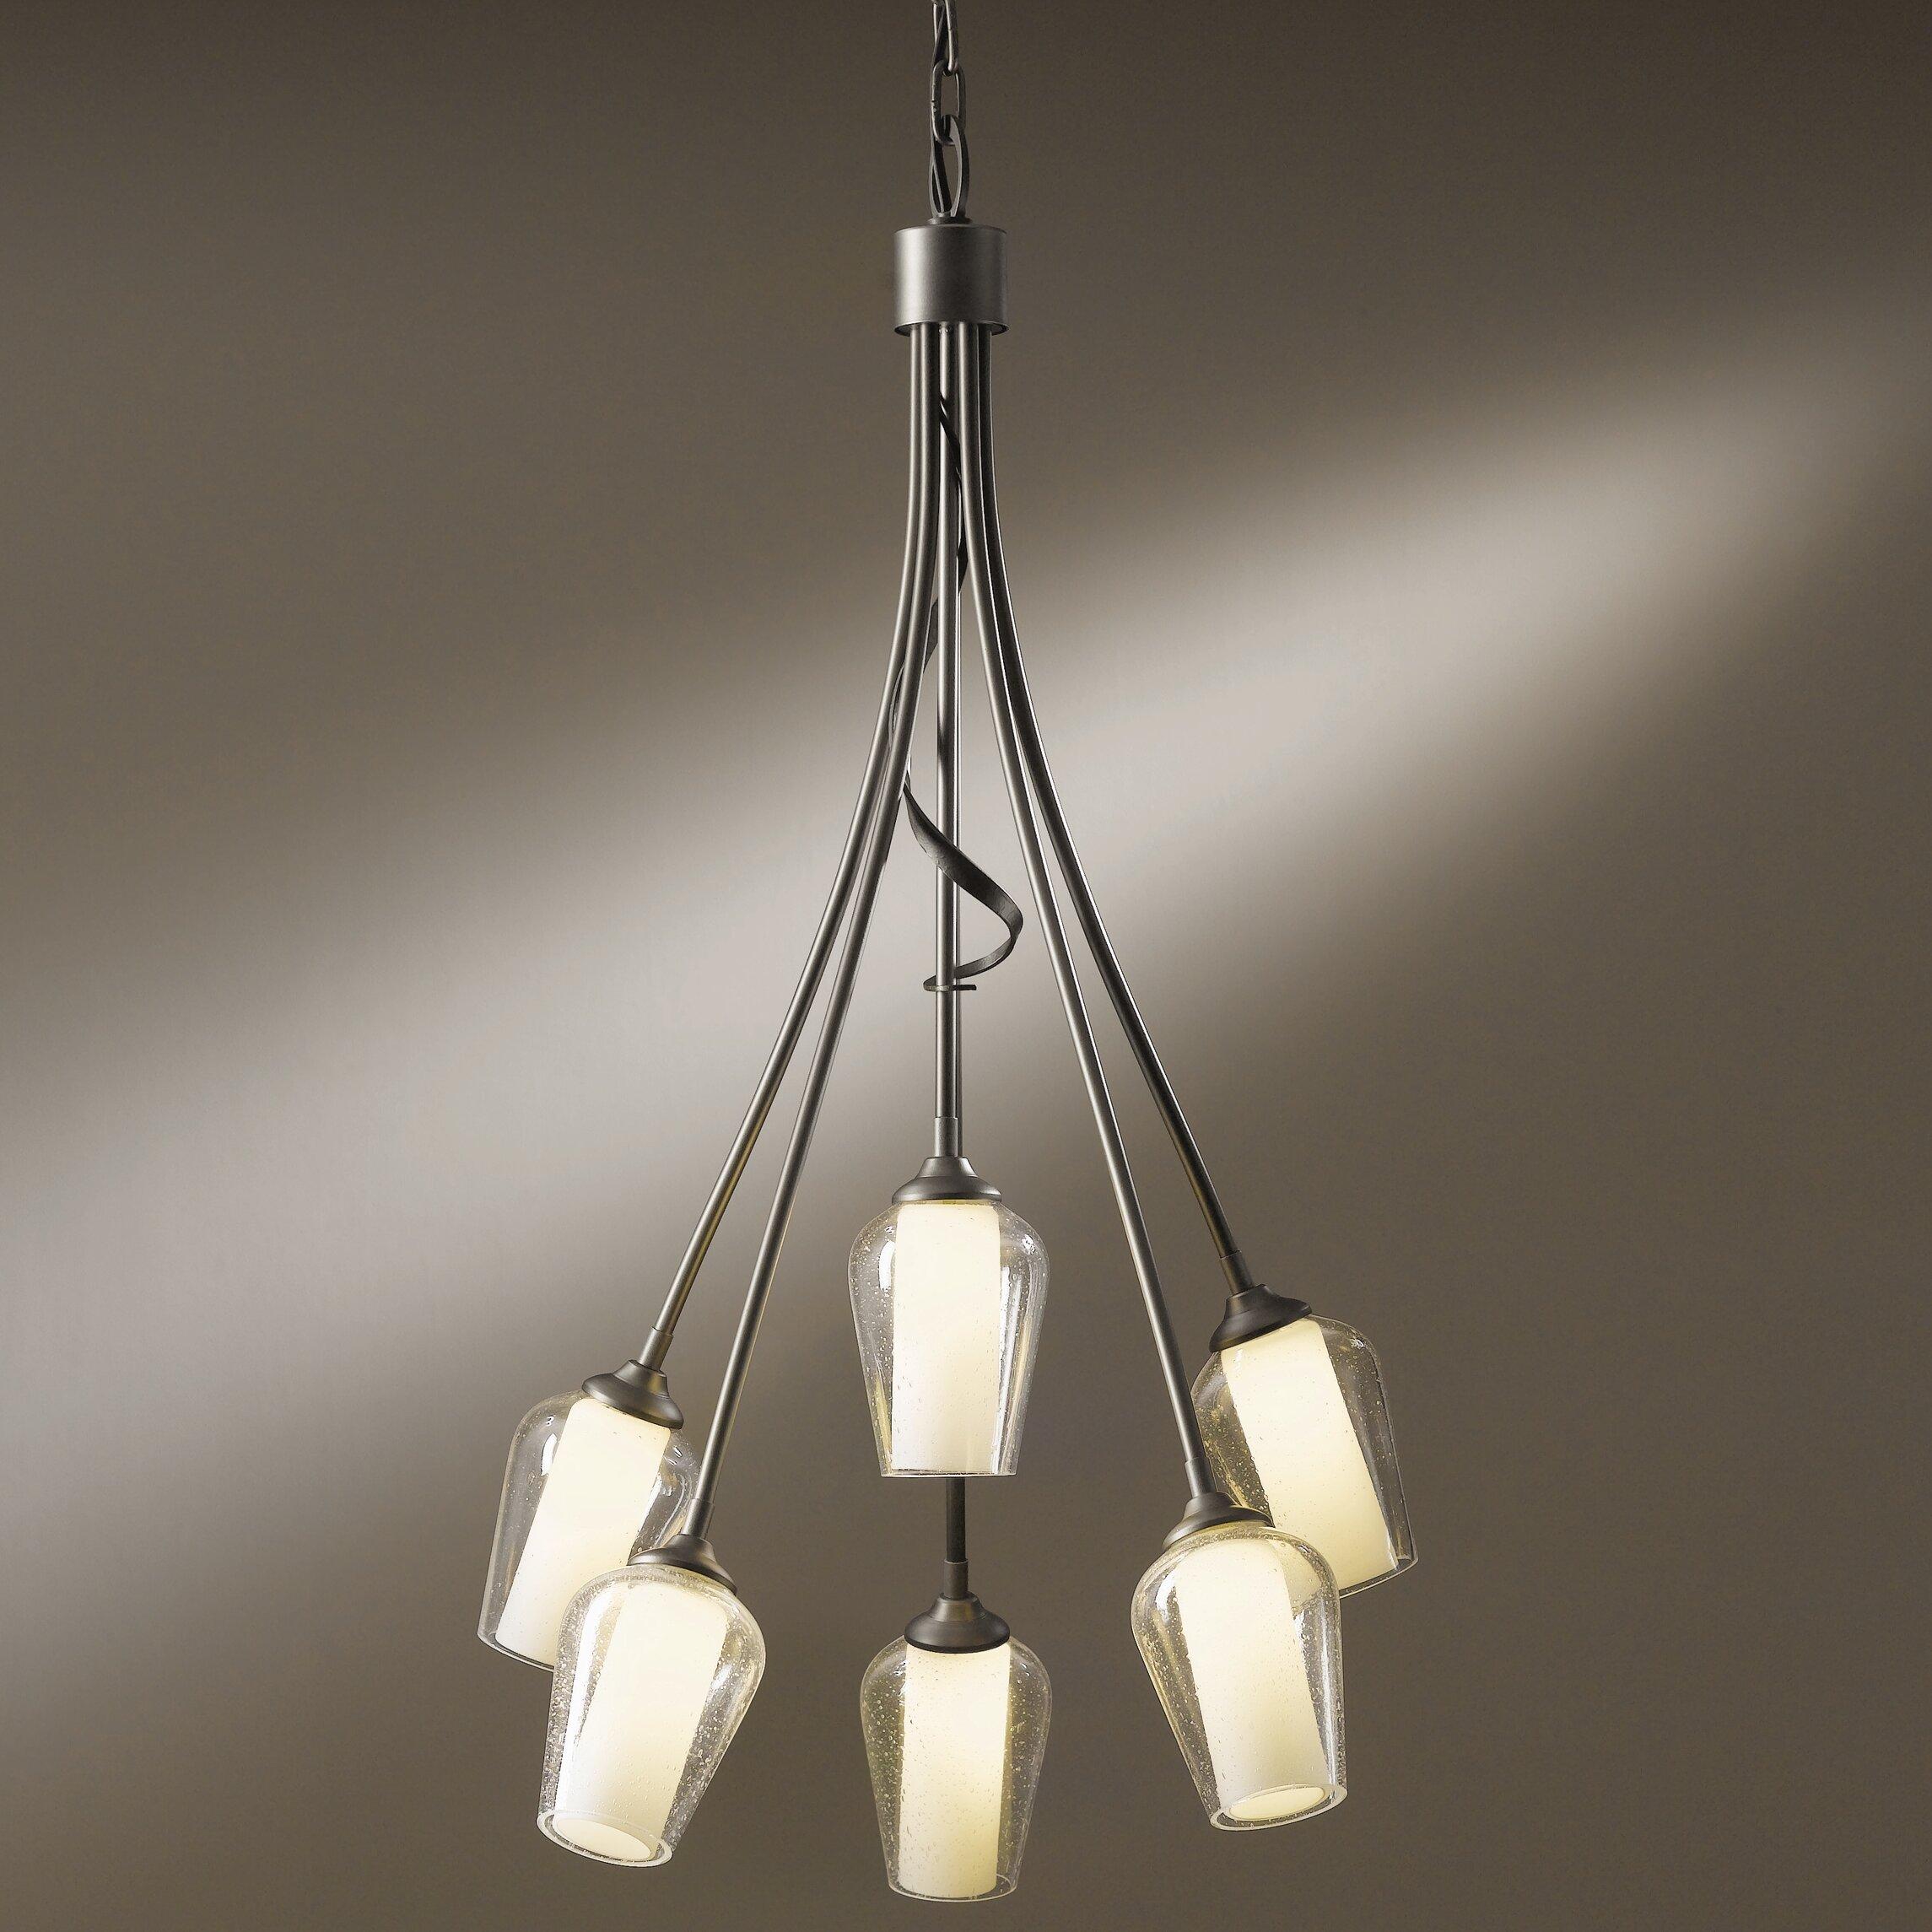 Flora 6 light chandelier wayfair for Hubbardton forge bathroom lighting